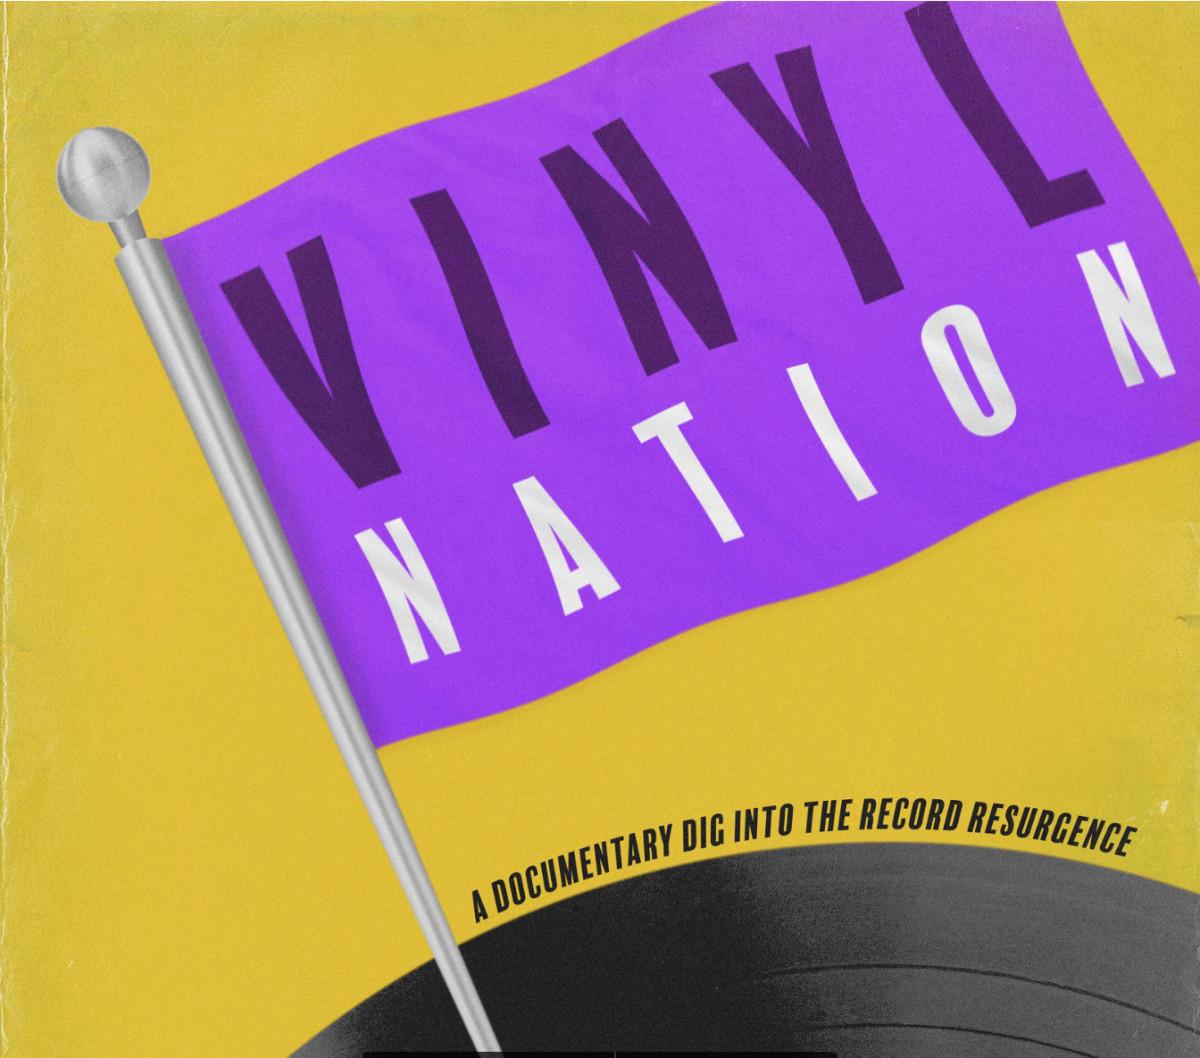 vinyl nation image